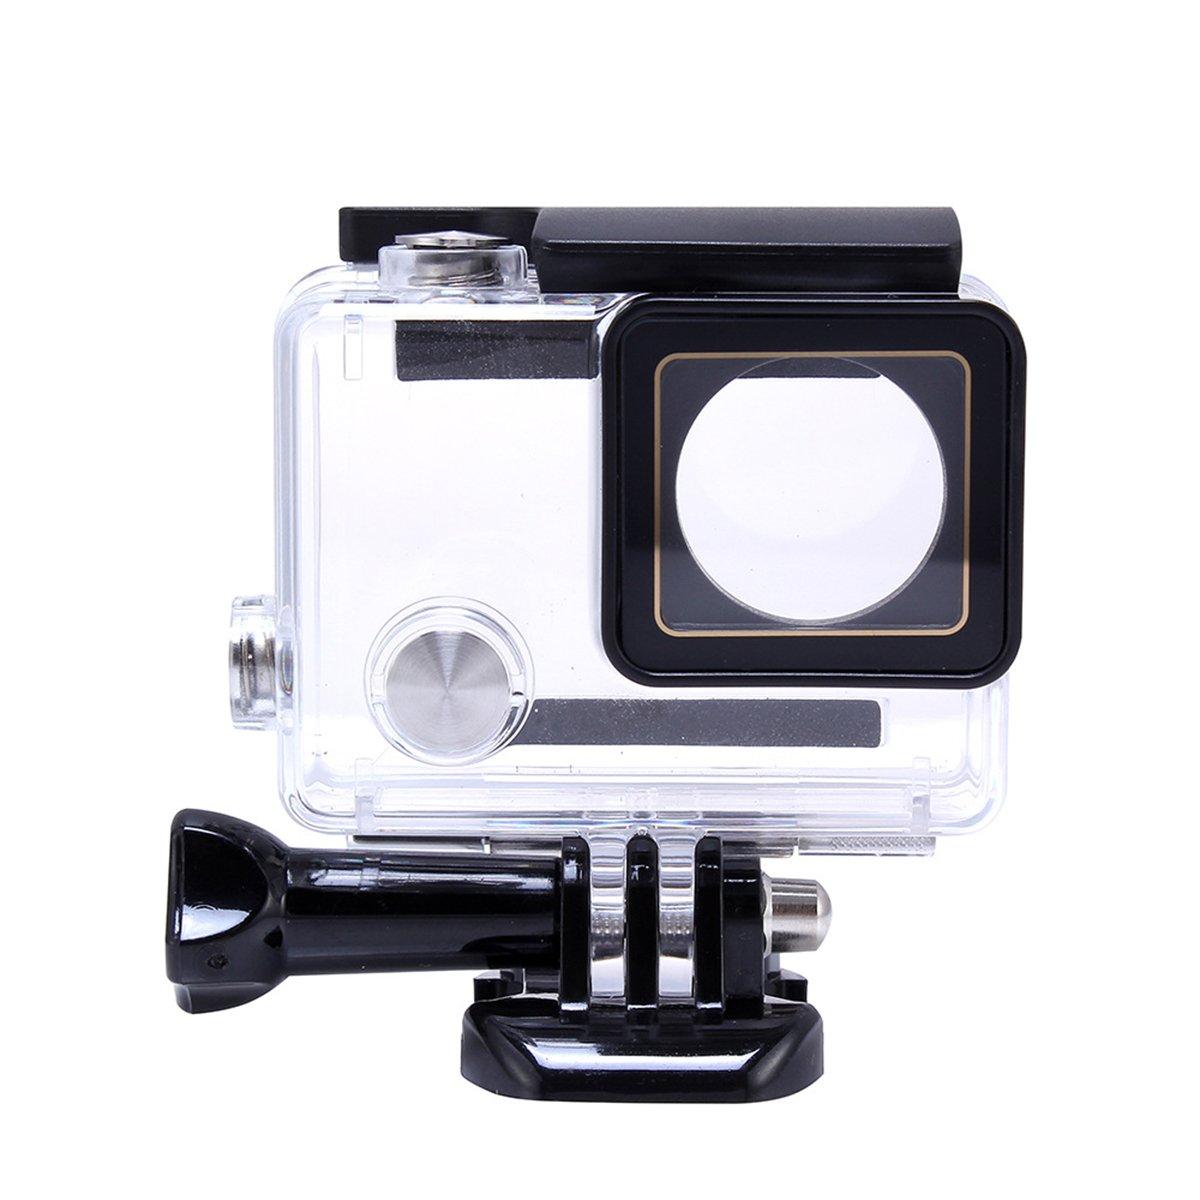 Greencherry交換用防水ケース、保護Diveハウジングfor GoPro Hero 4 , 3 +、外側3スポーツカメラアクションカメラ、Underwater 40 m ( 131ft )   B0775SYVTC